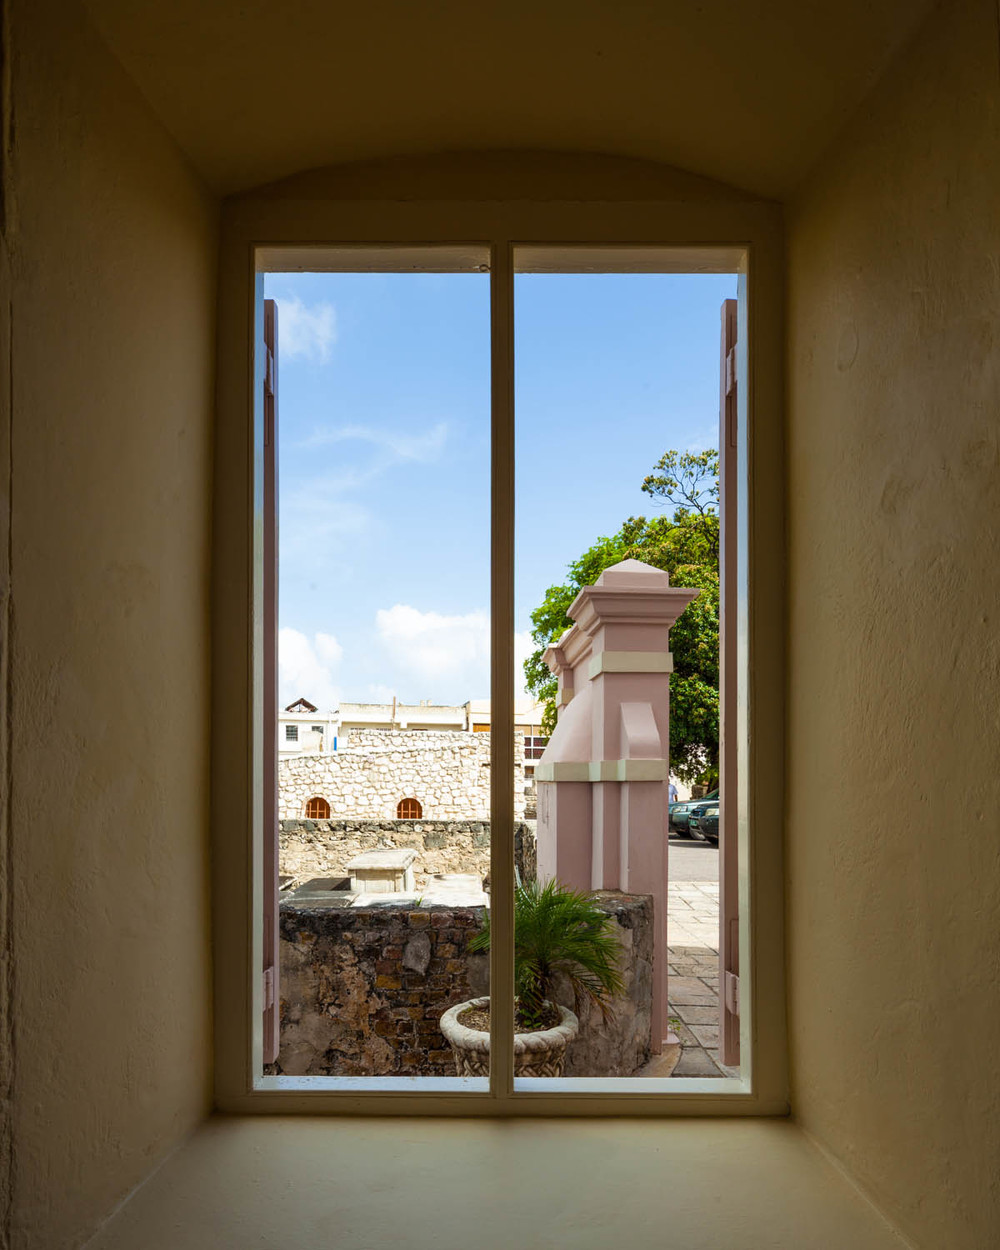 Barbados_2012_03943.jpg